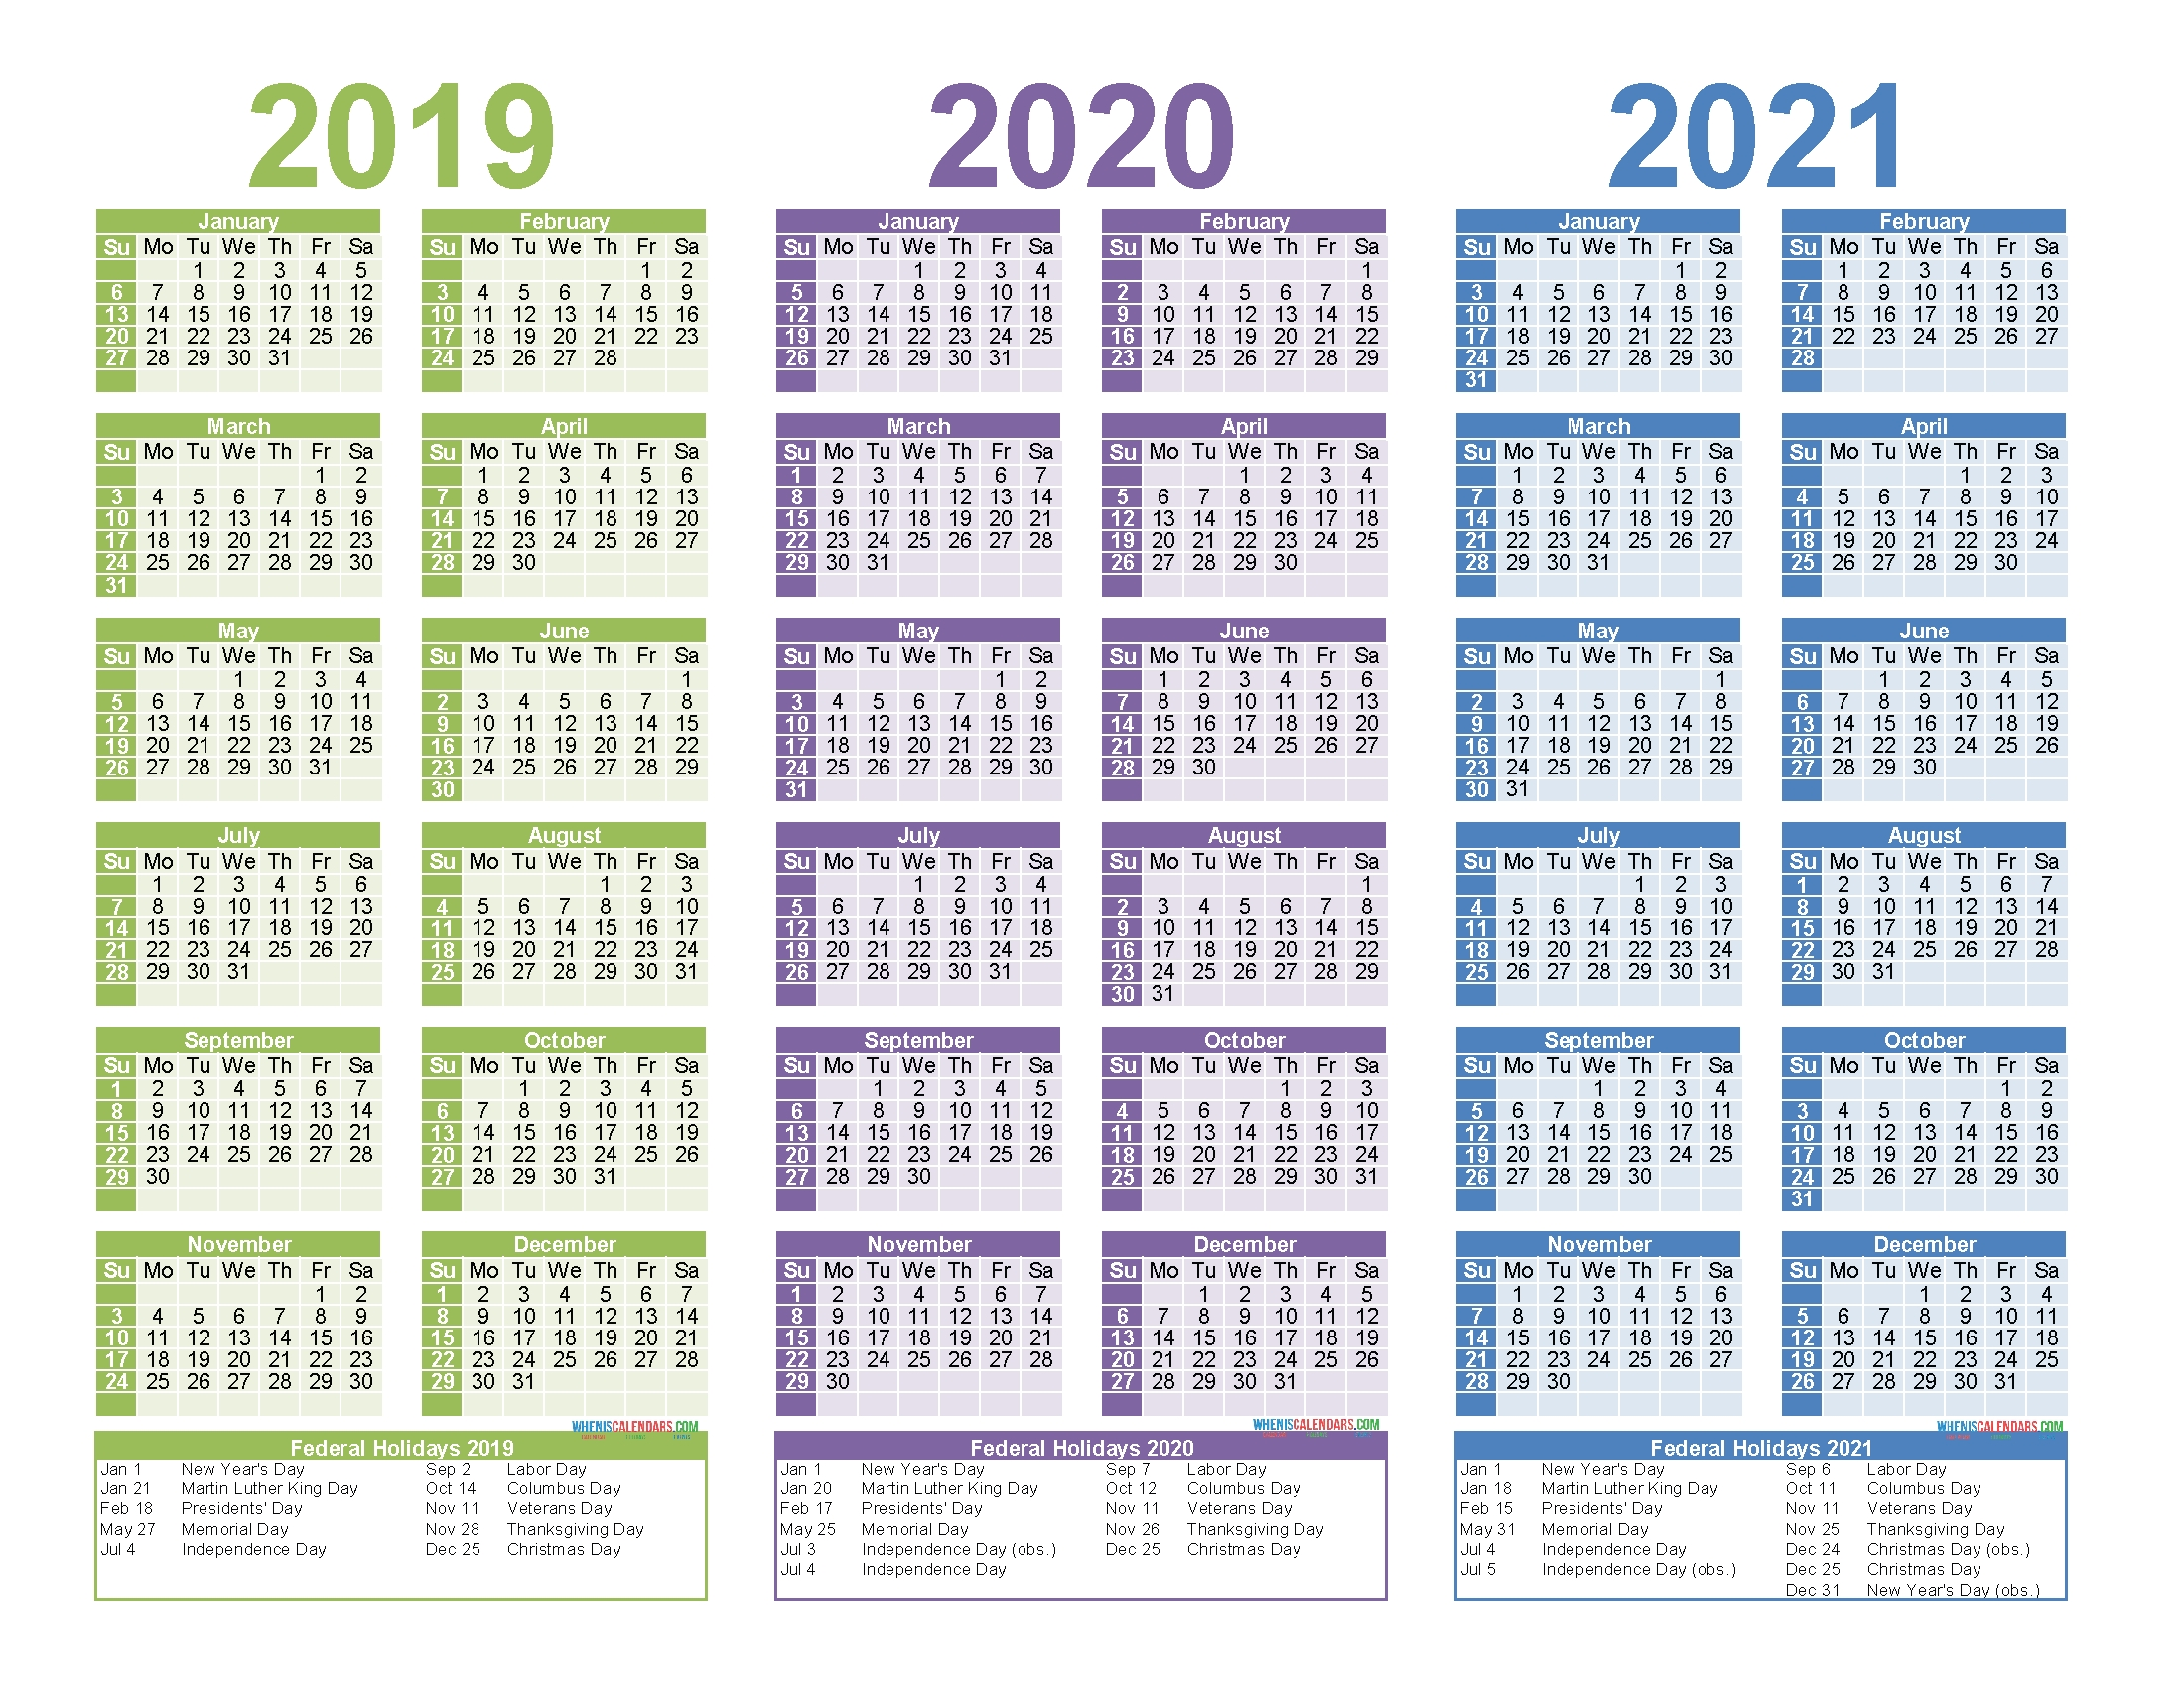 2019 To 2021 3 Year Calendar Printable Free Pdf, Word